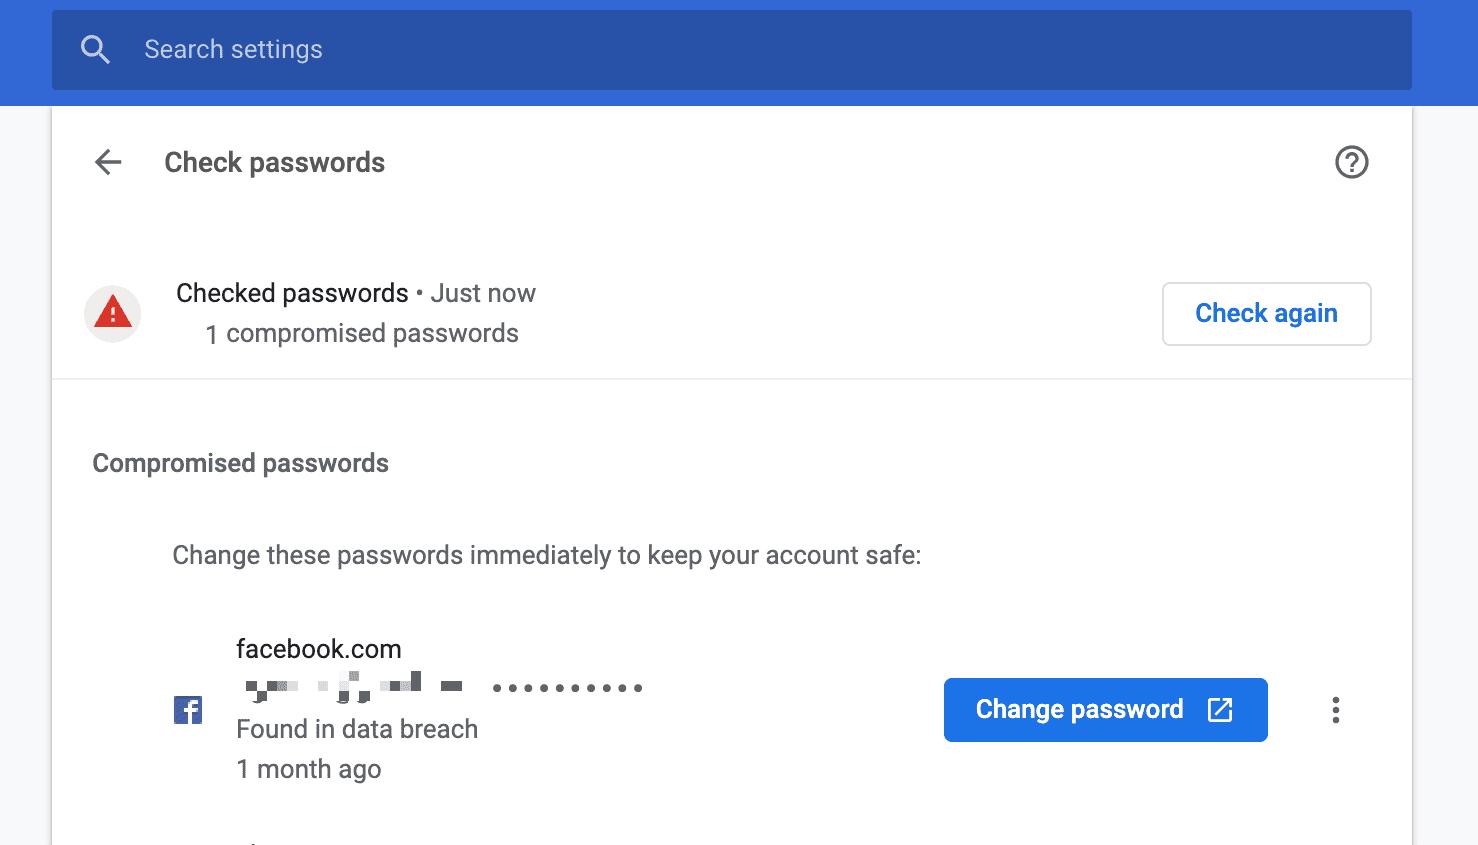 chrome change password link